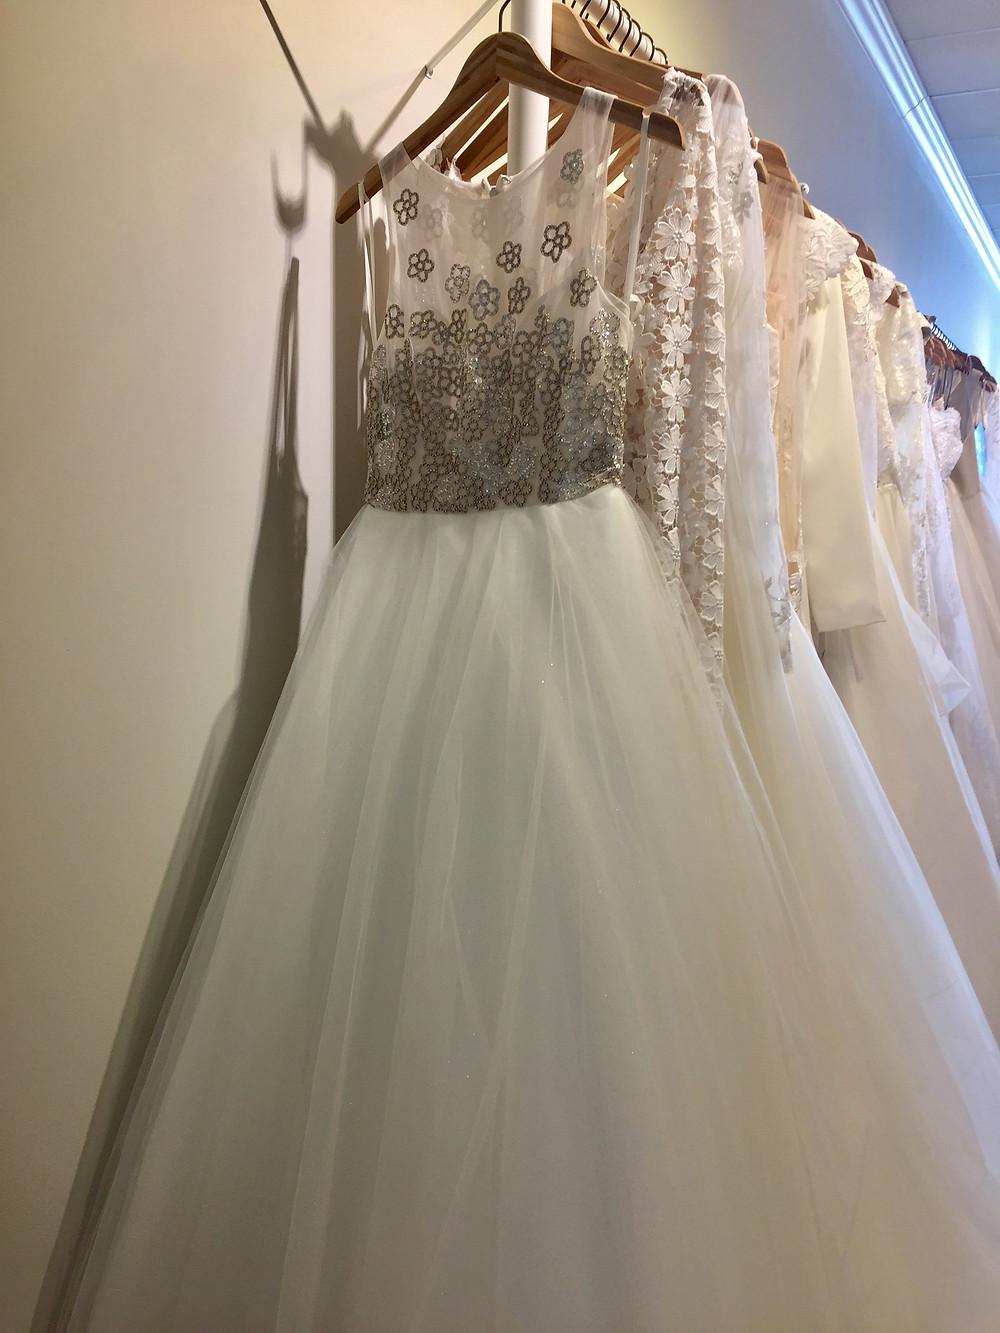 Fabulous Frocks - Wedding Dresses